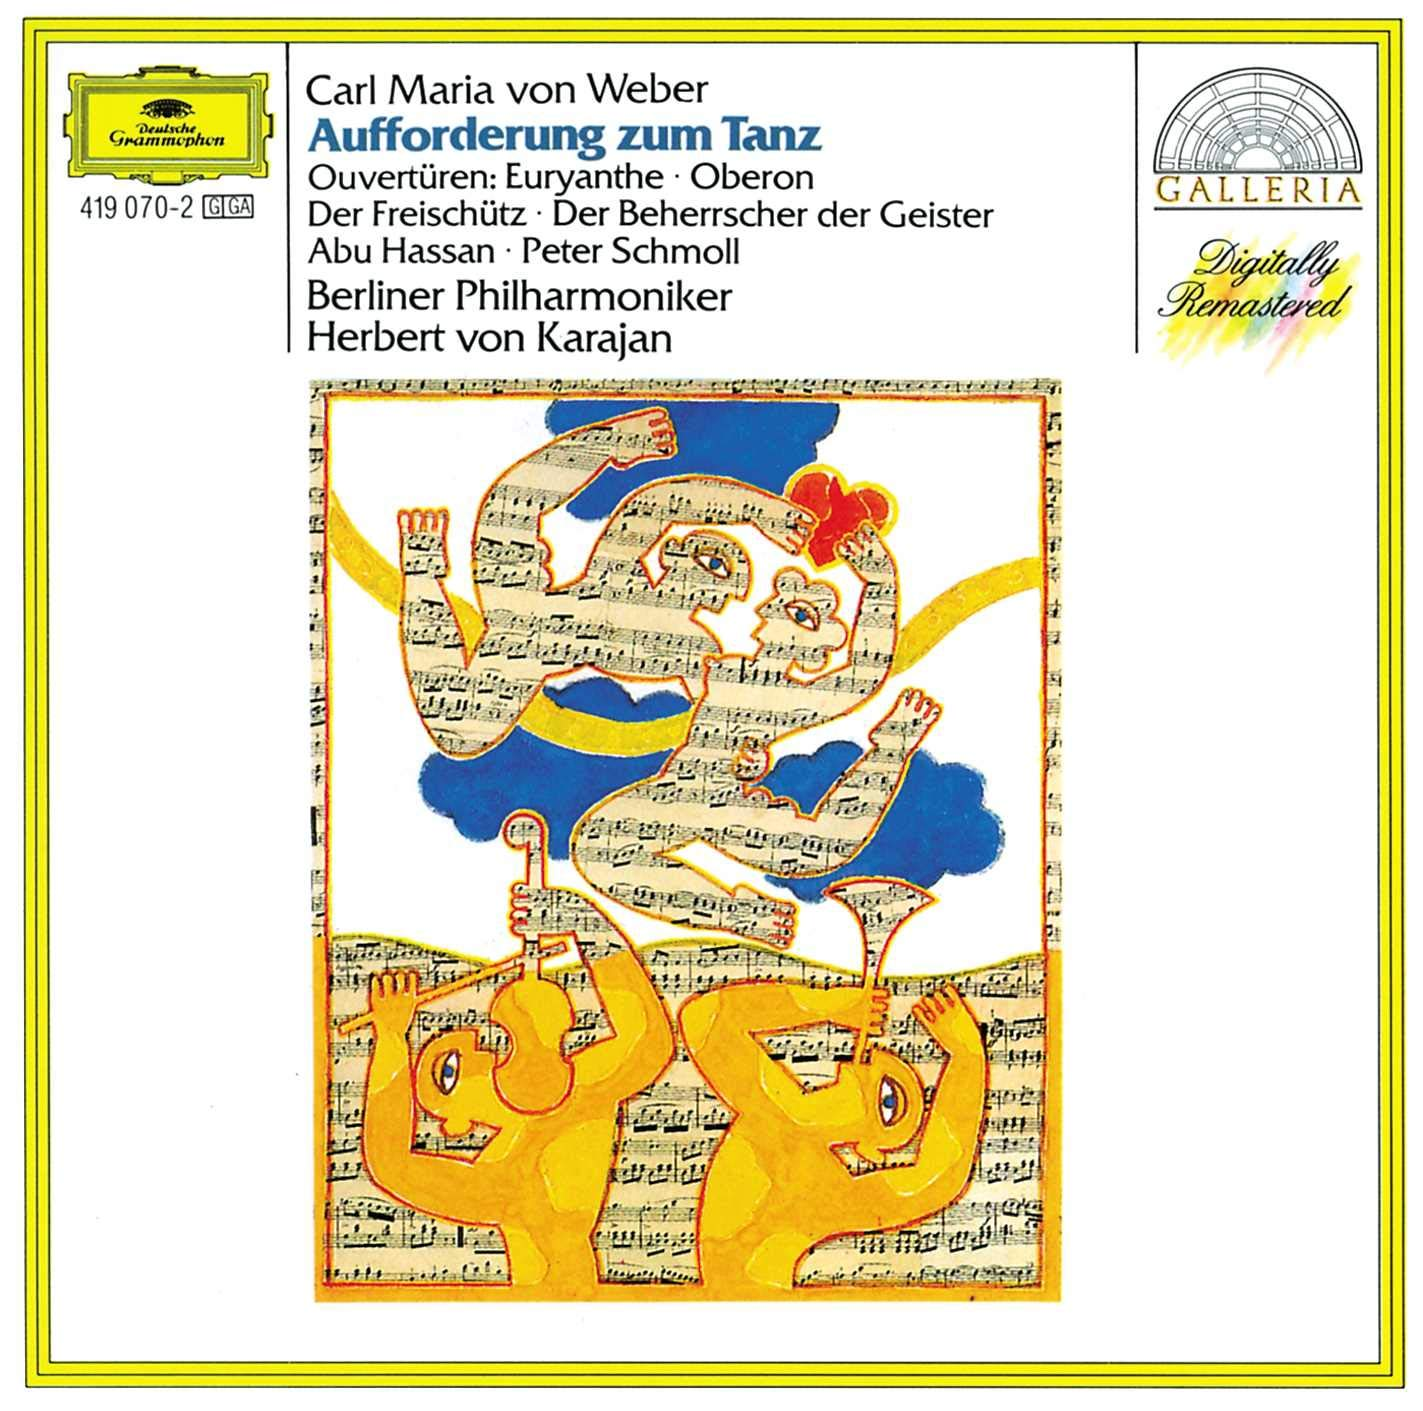 Carl Maria von WEBER - Euryanthe, Oberon & autres opéras - Page 3 71619cxz4HL._SL1423_